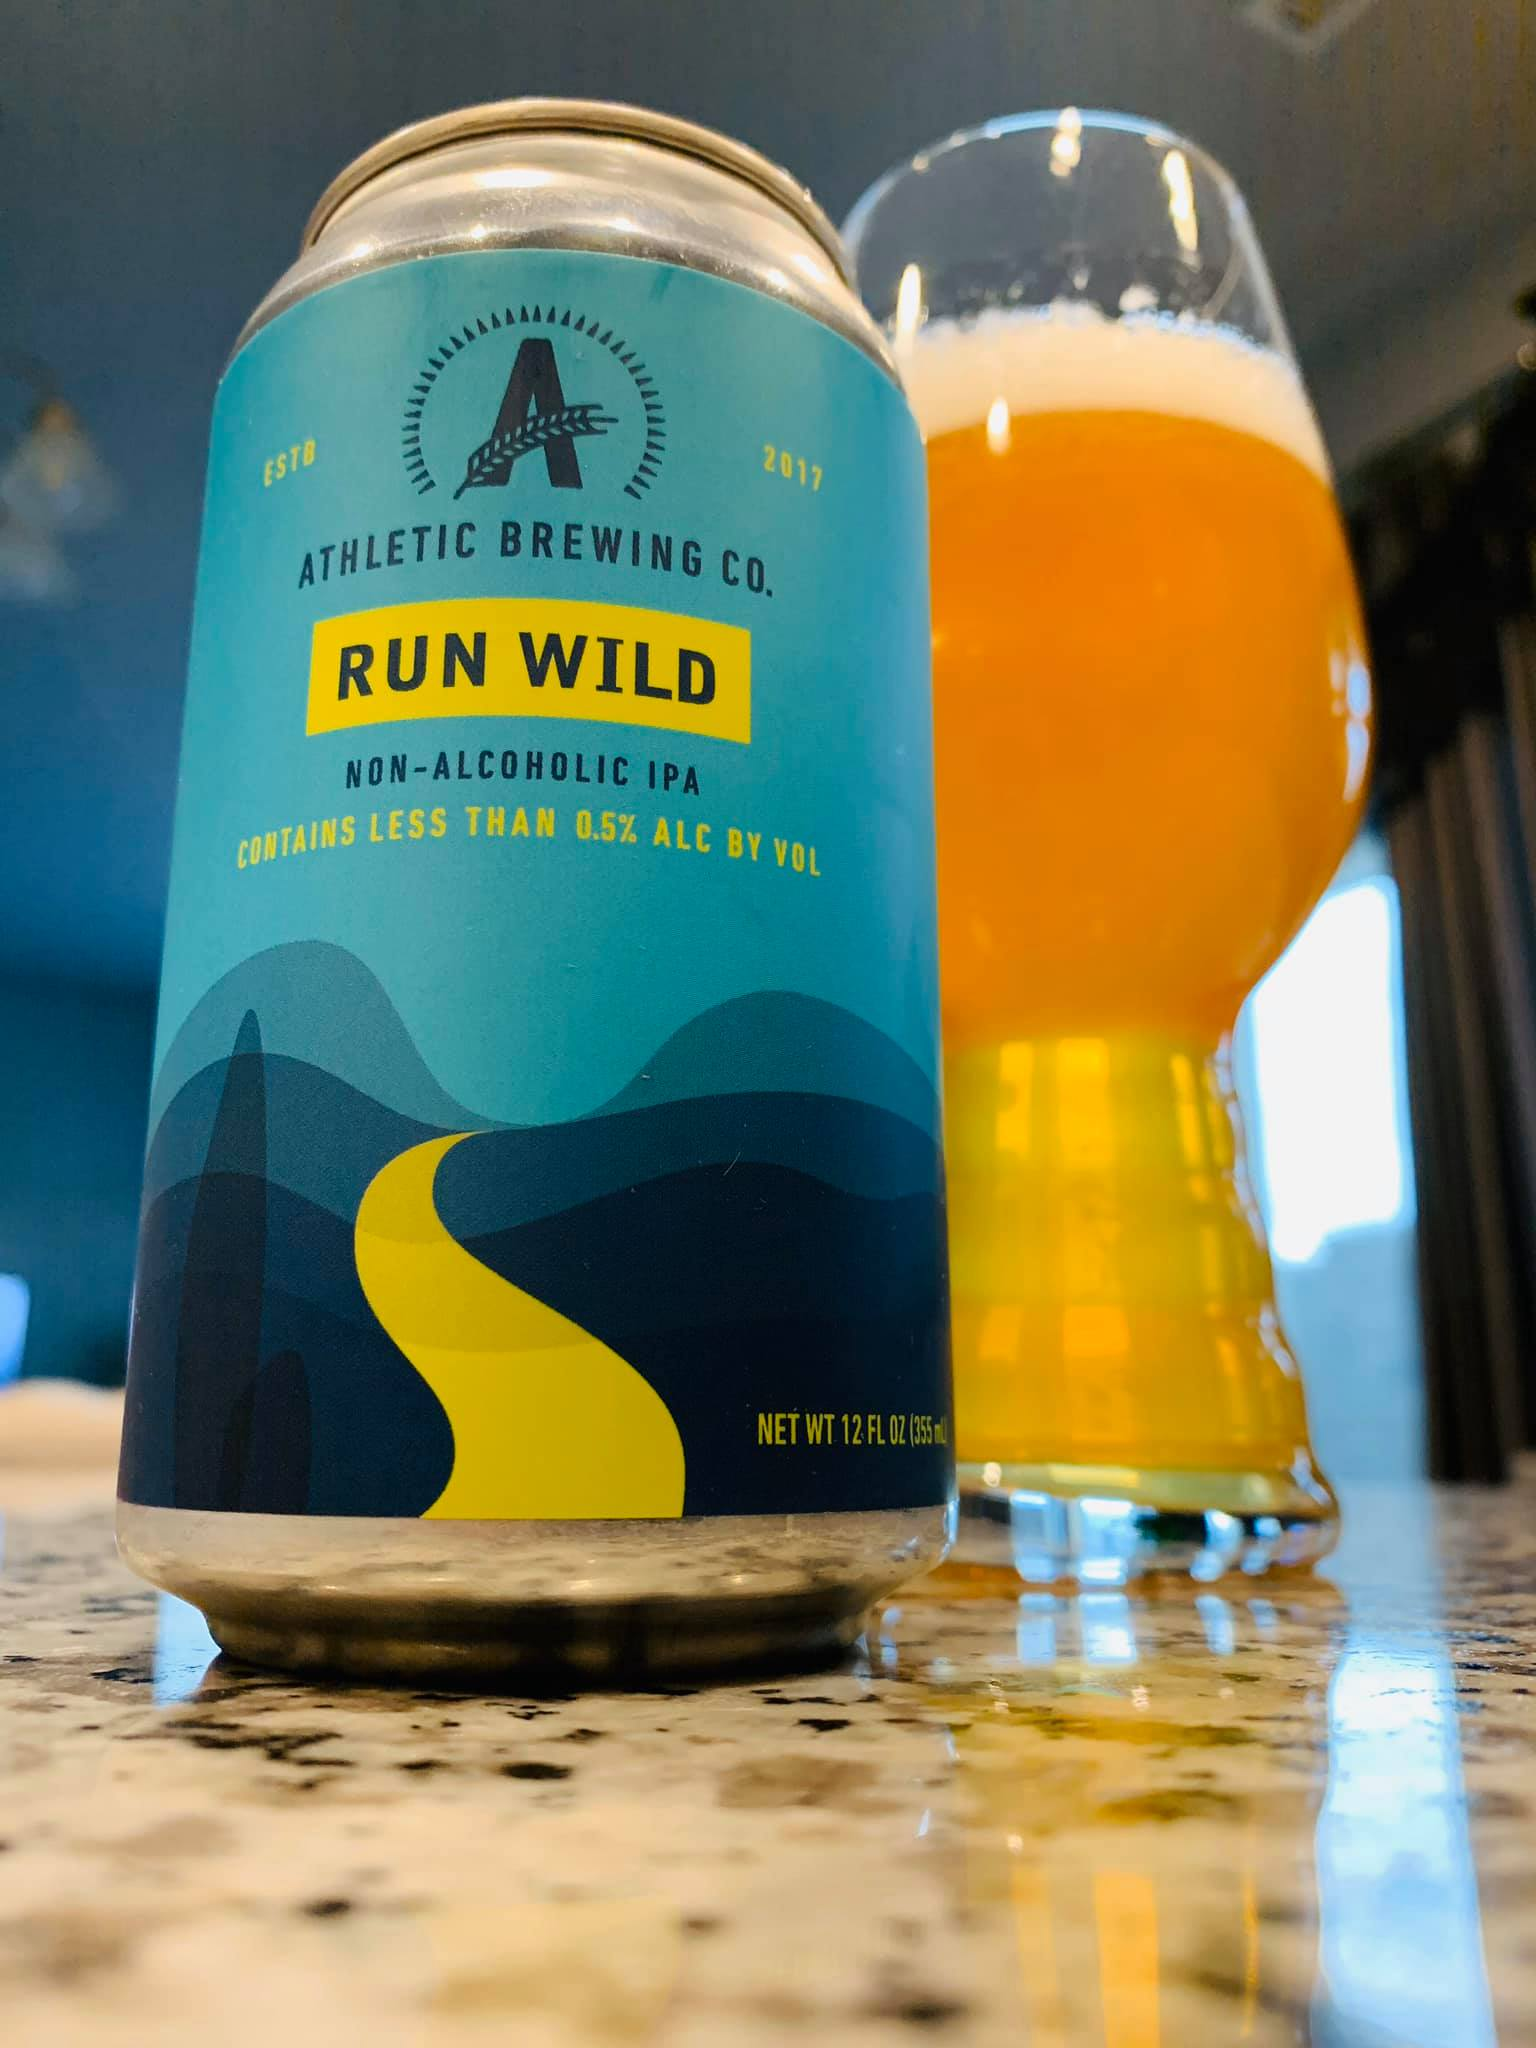 Athletic Brewing Co. Run Wild Non-Alcoholic IPA